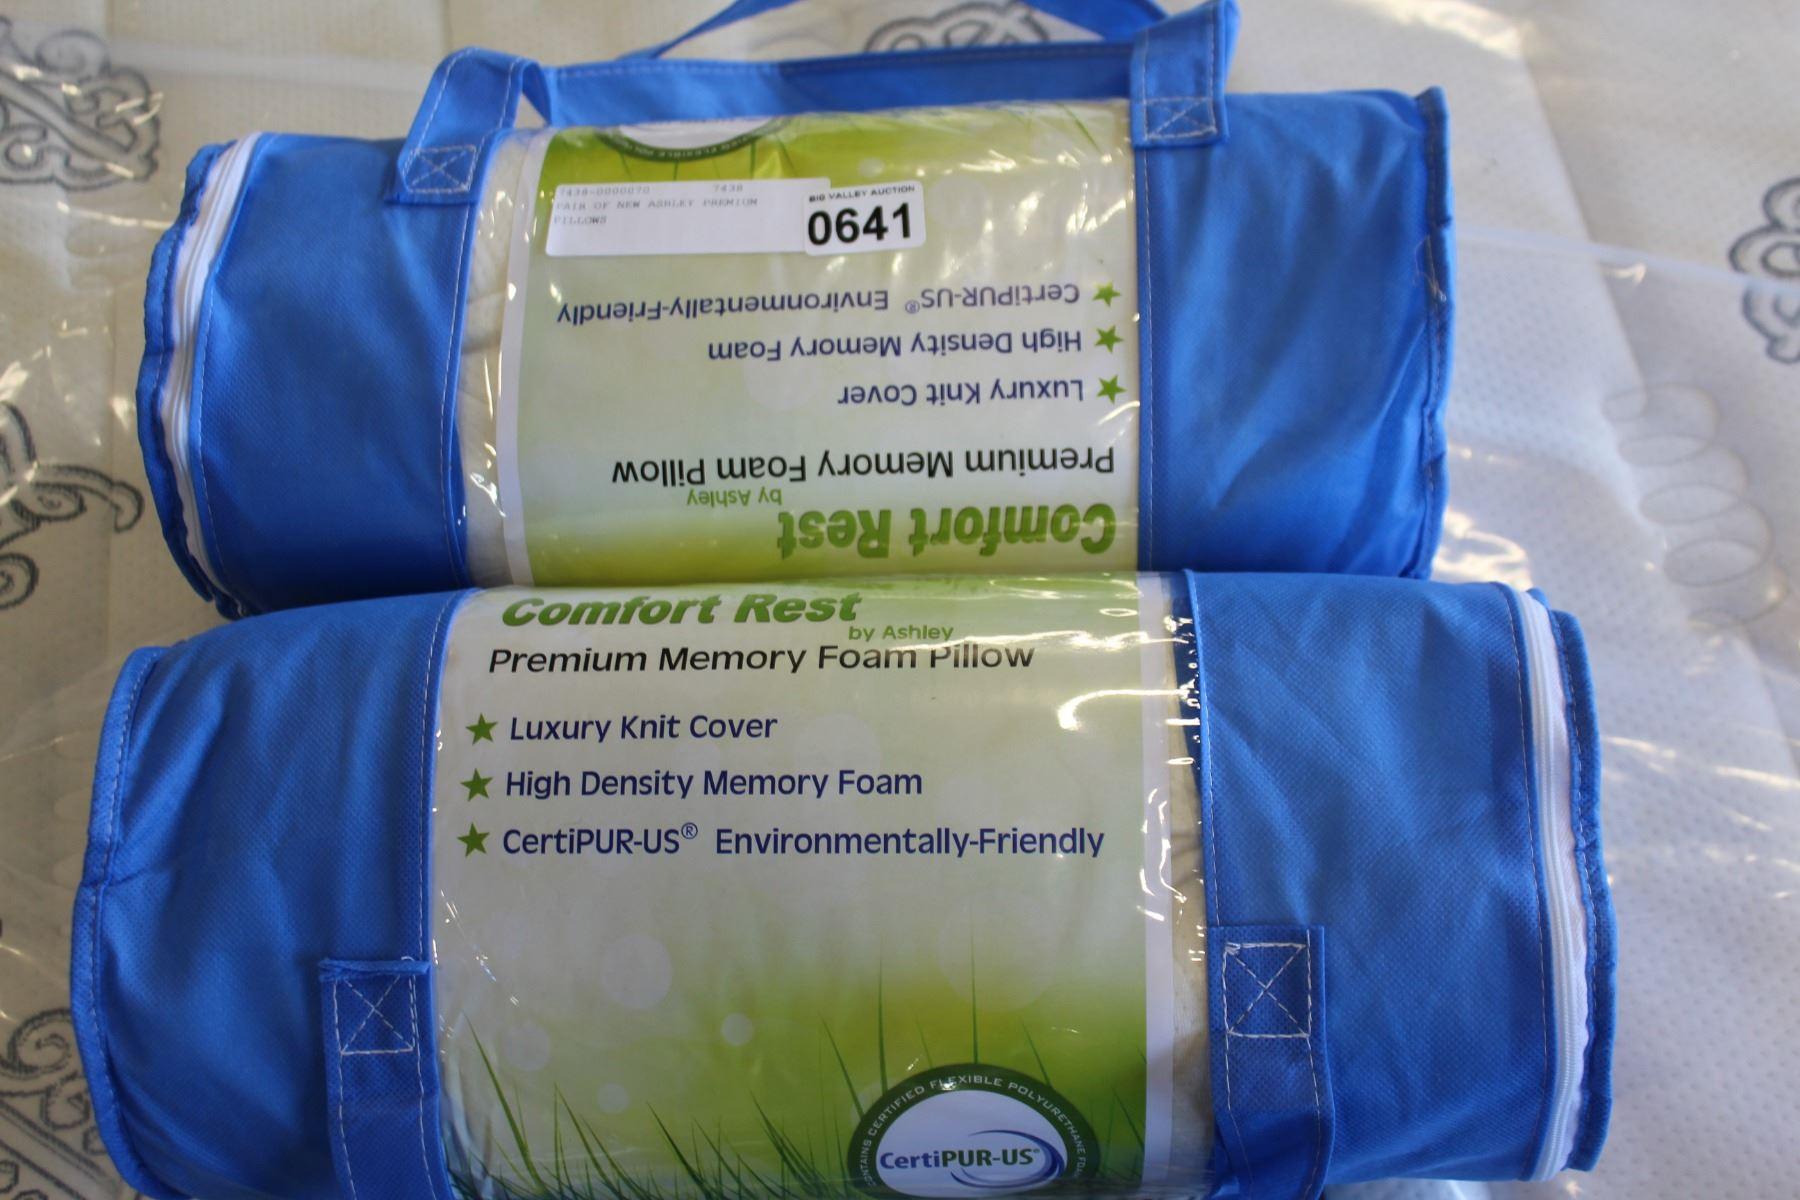 Comfort Rest by Ashley Premium Memory Foam Pillow